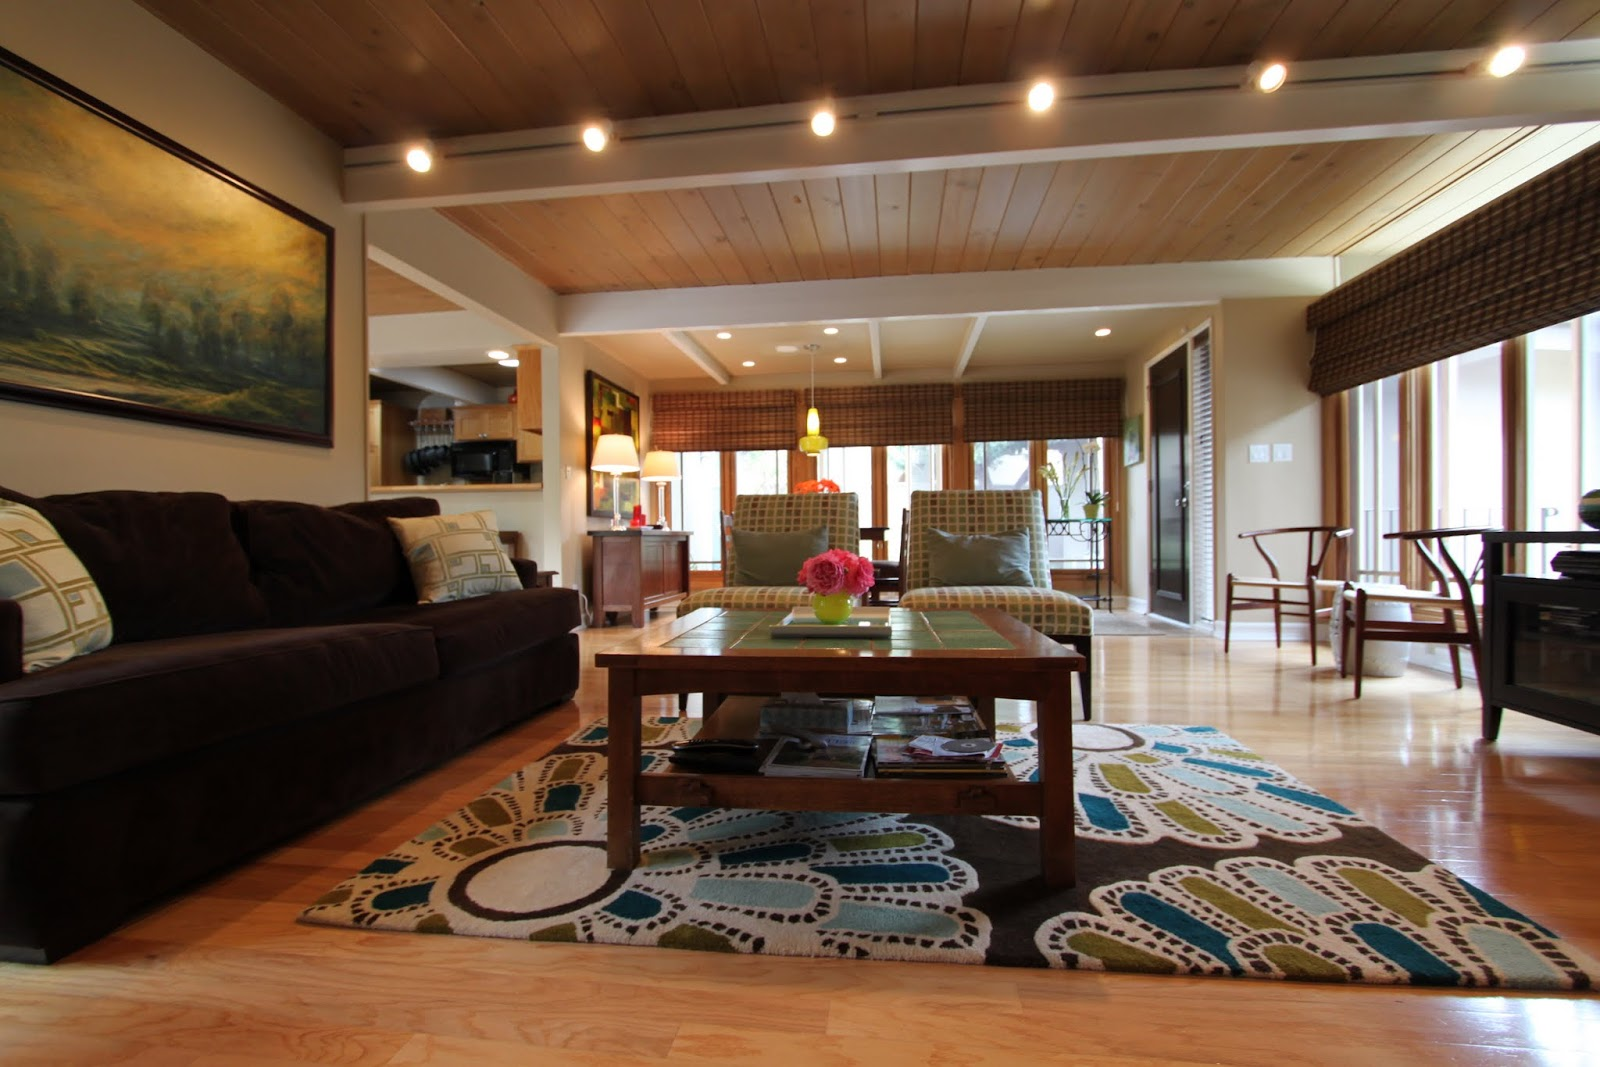 An eichler in orange mid century modern remodel - Mid century modern living room ...